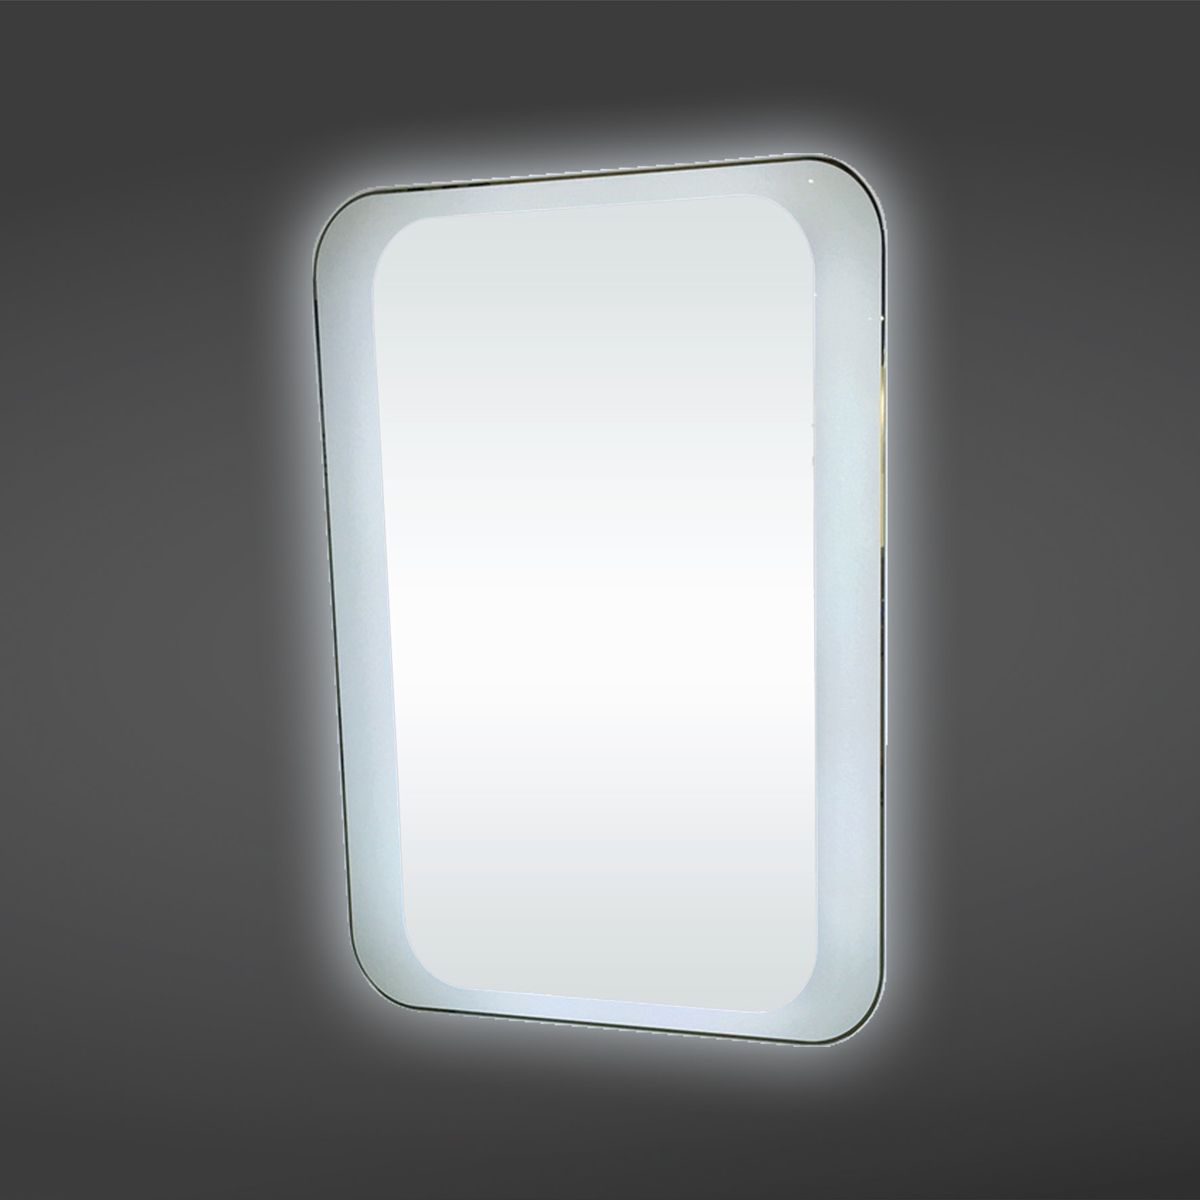 RAK Moon Illuminated LED Mirror with Bluetooth 800 x 600mm